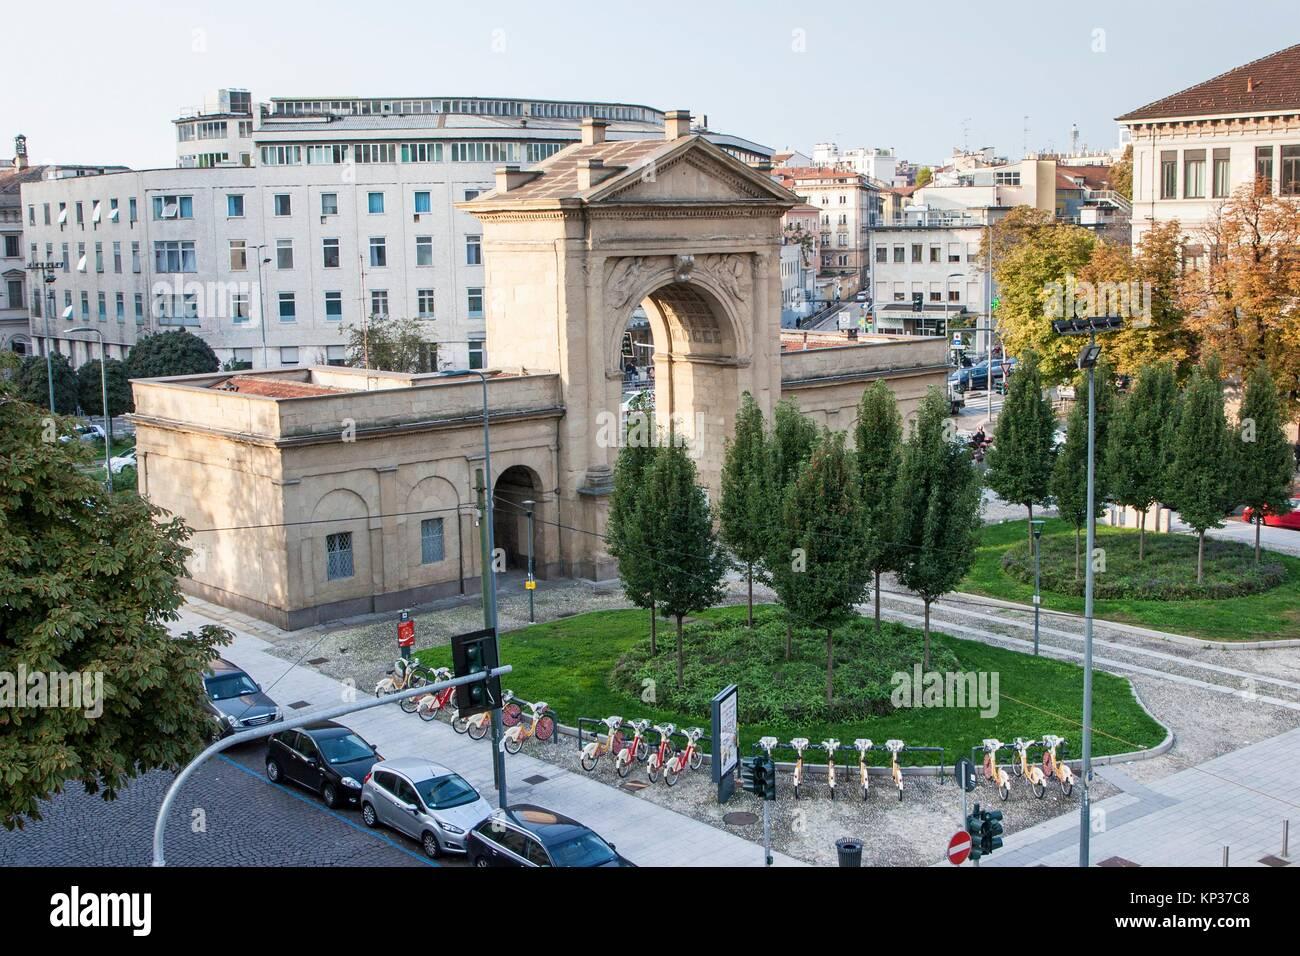 Porta Nuova, Principessa Clotilde square, Milan, Lombardy, Italy. Stock Photo